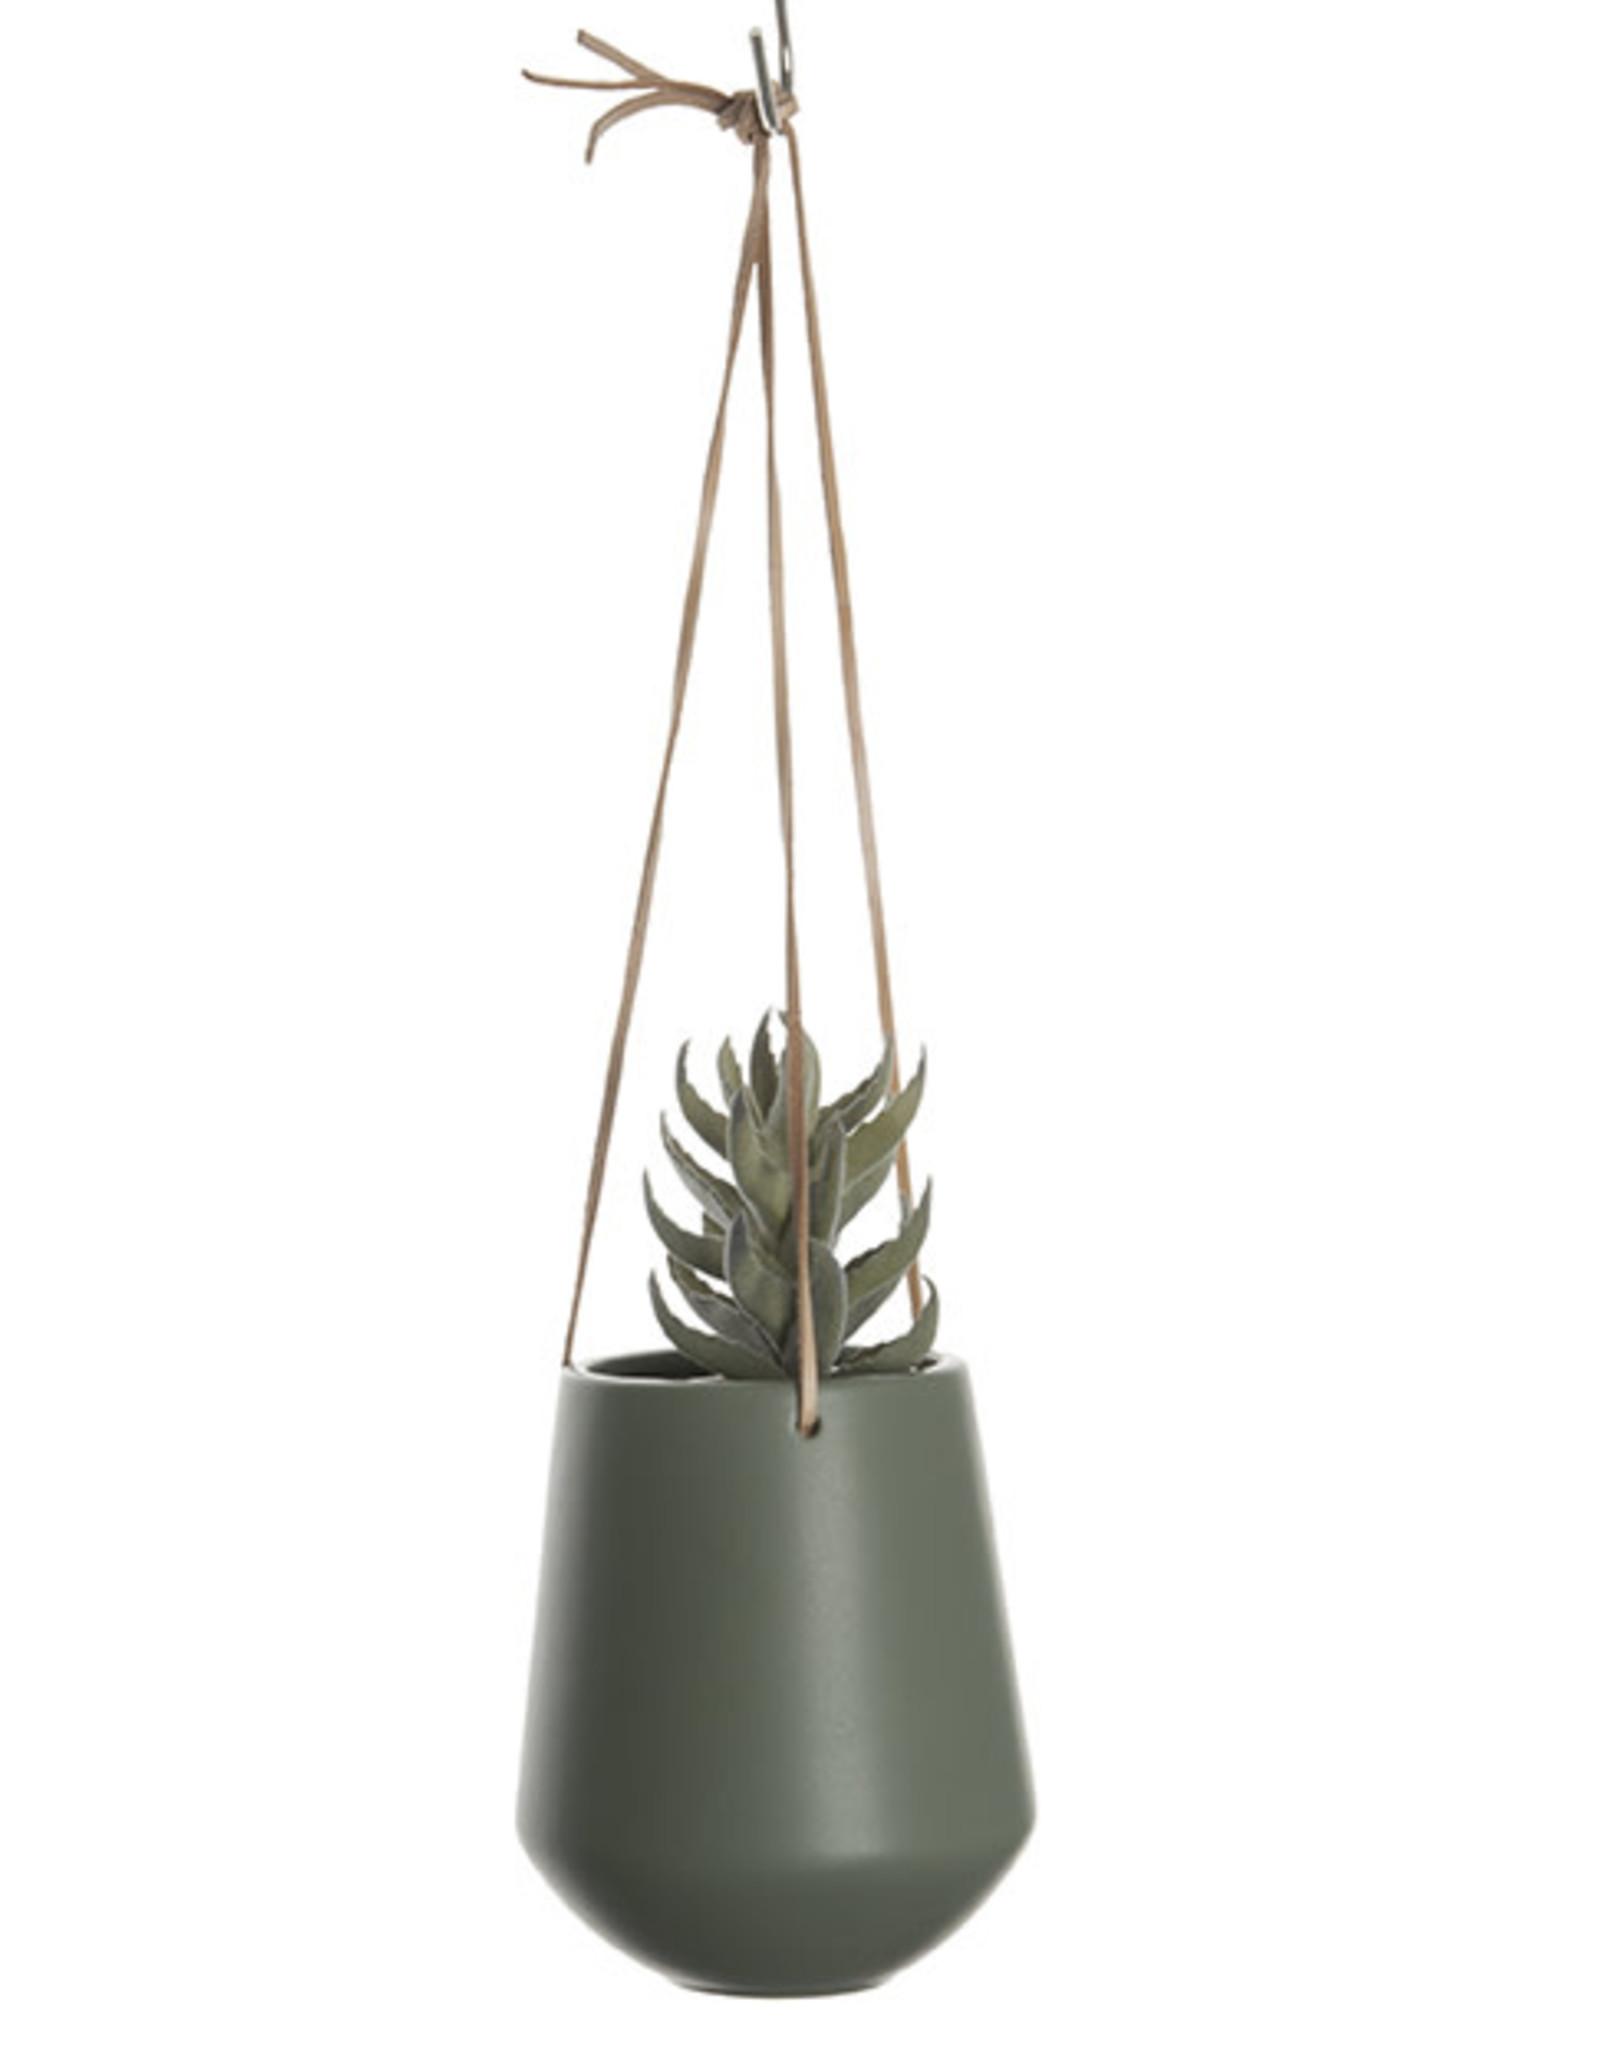 pt Skittle hanging pot Ø9.5 h16 cm - Jungle green